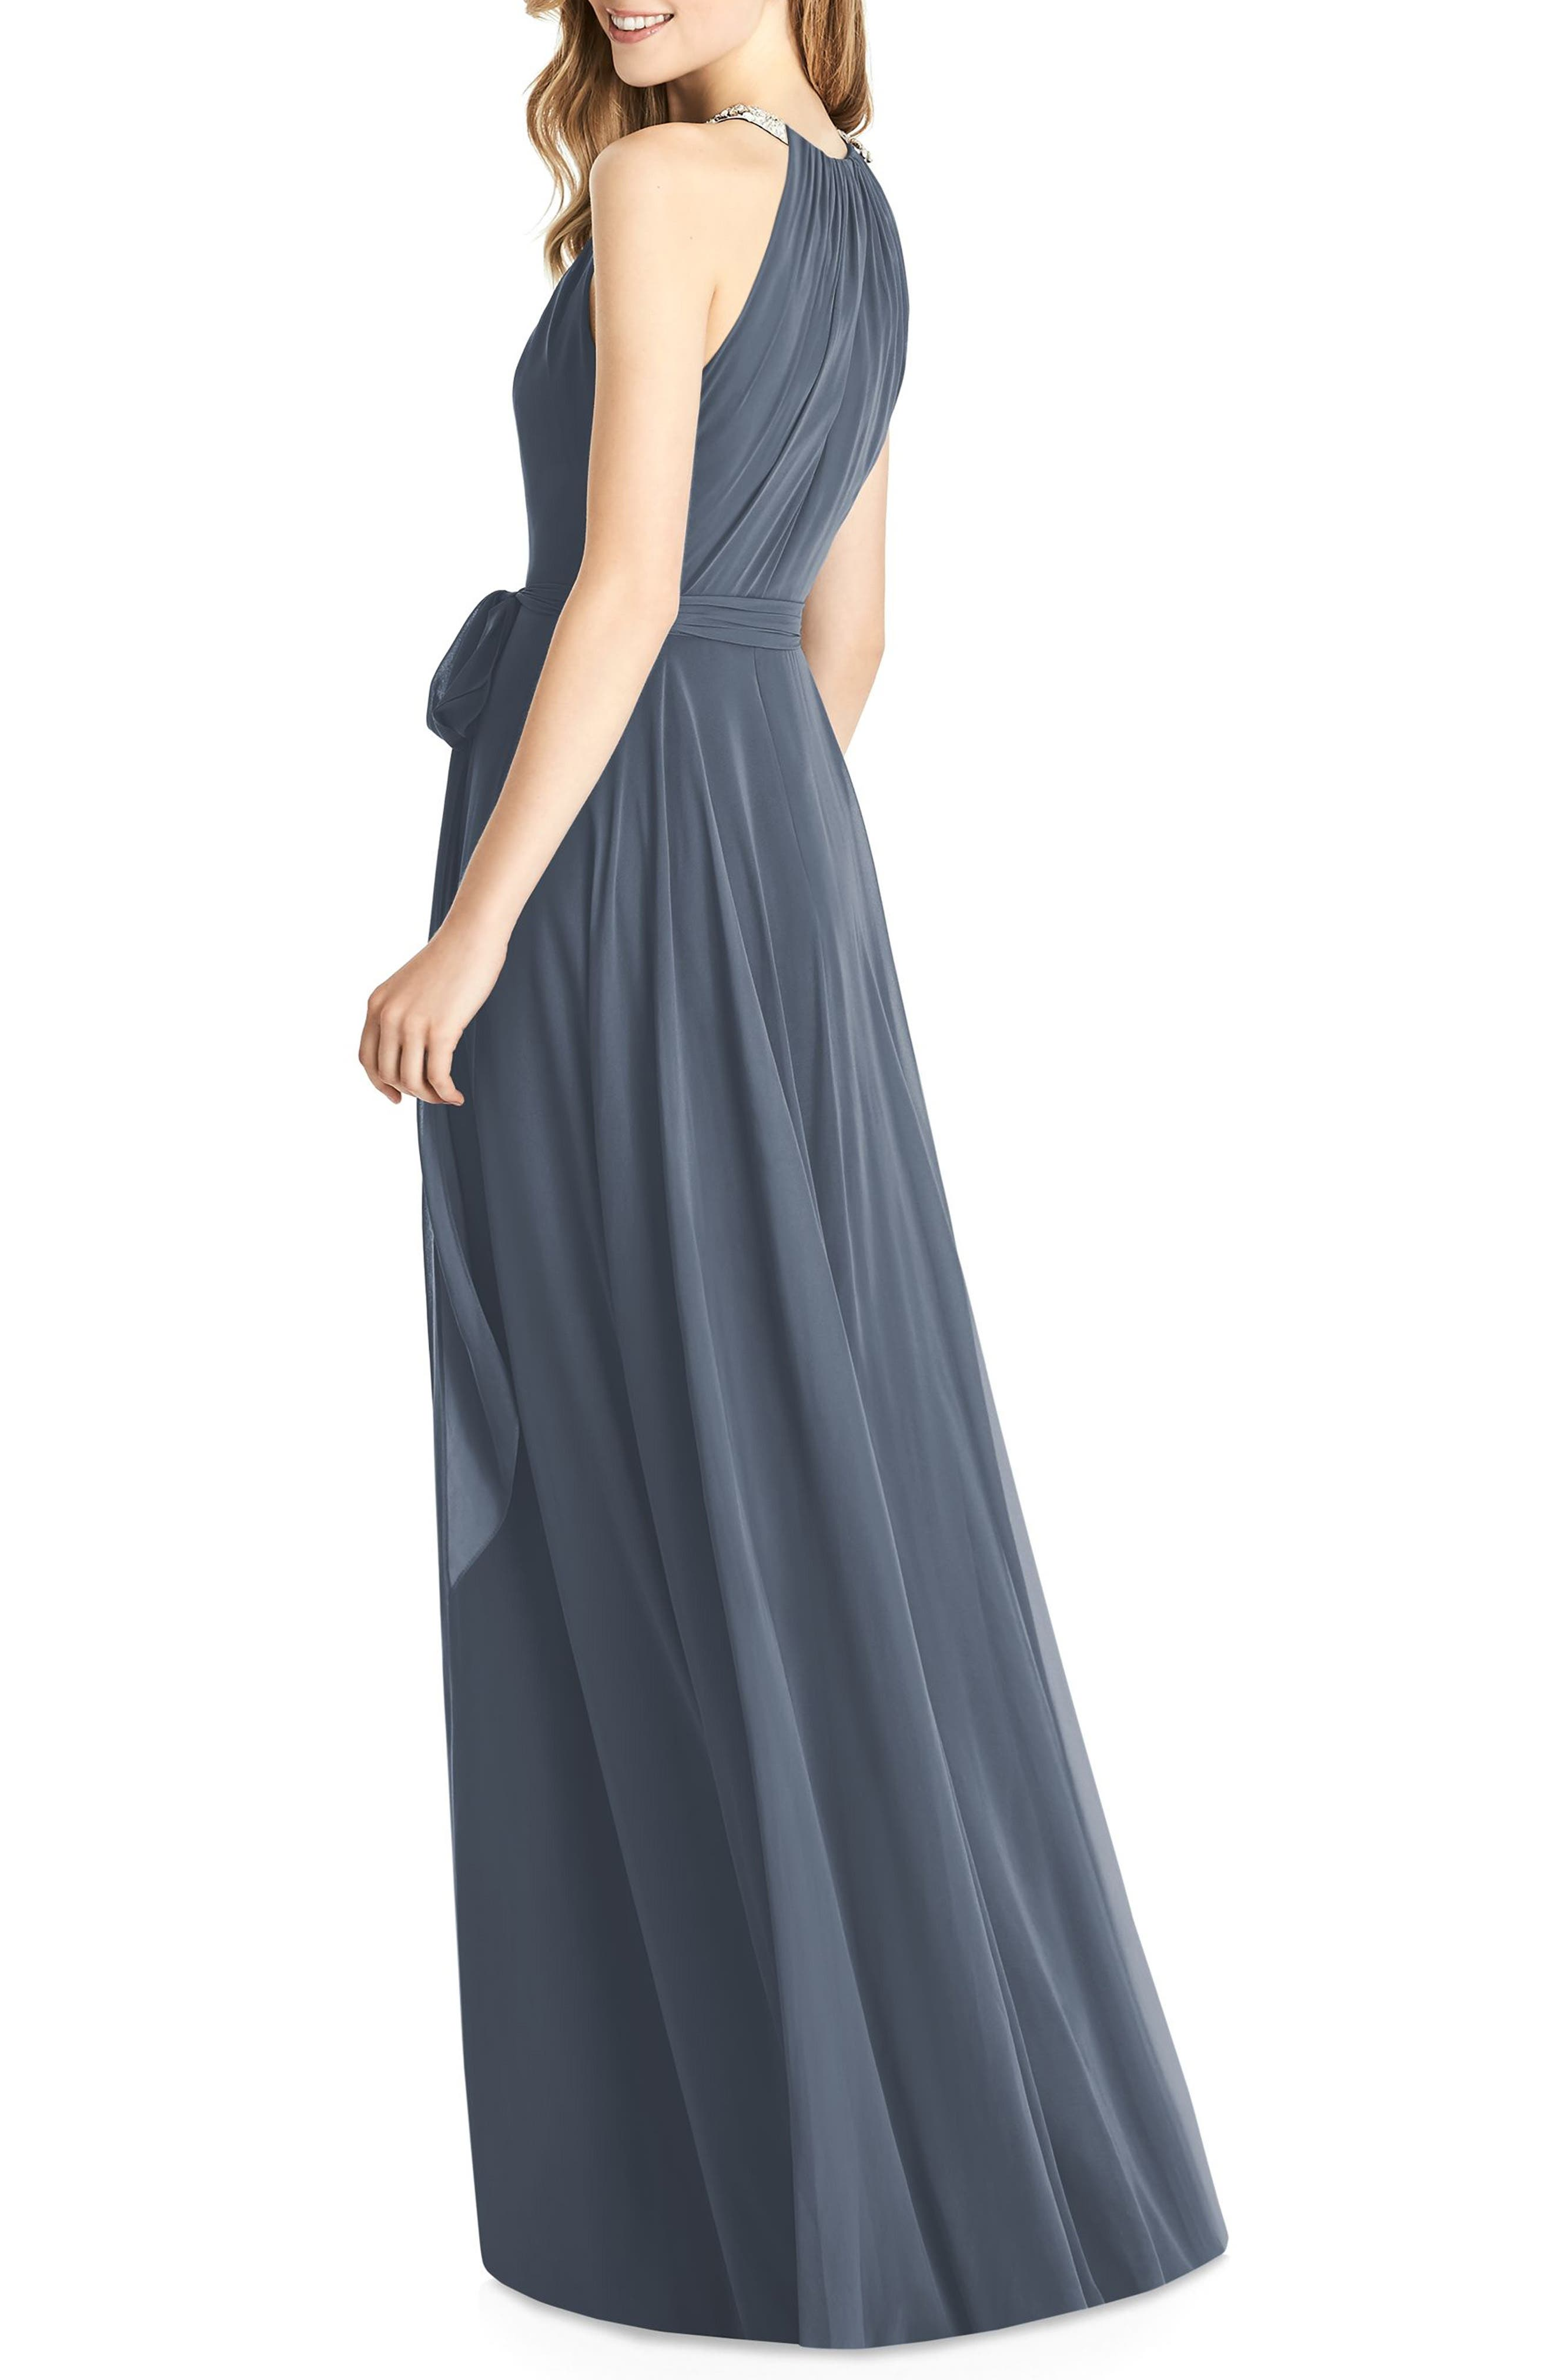 JENNY PACKHAM,                             Beaded Strap Chiffon Gown,                             Alternate thumbnail 2, color,                             SILVERSTONE